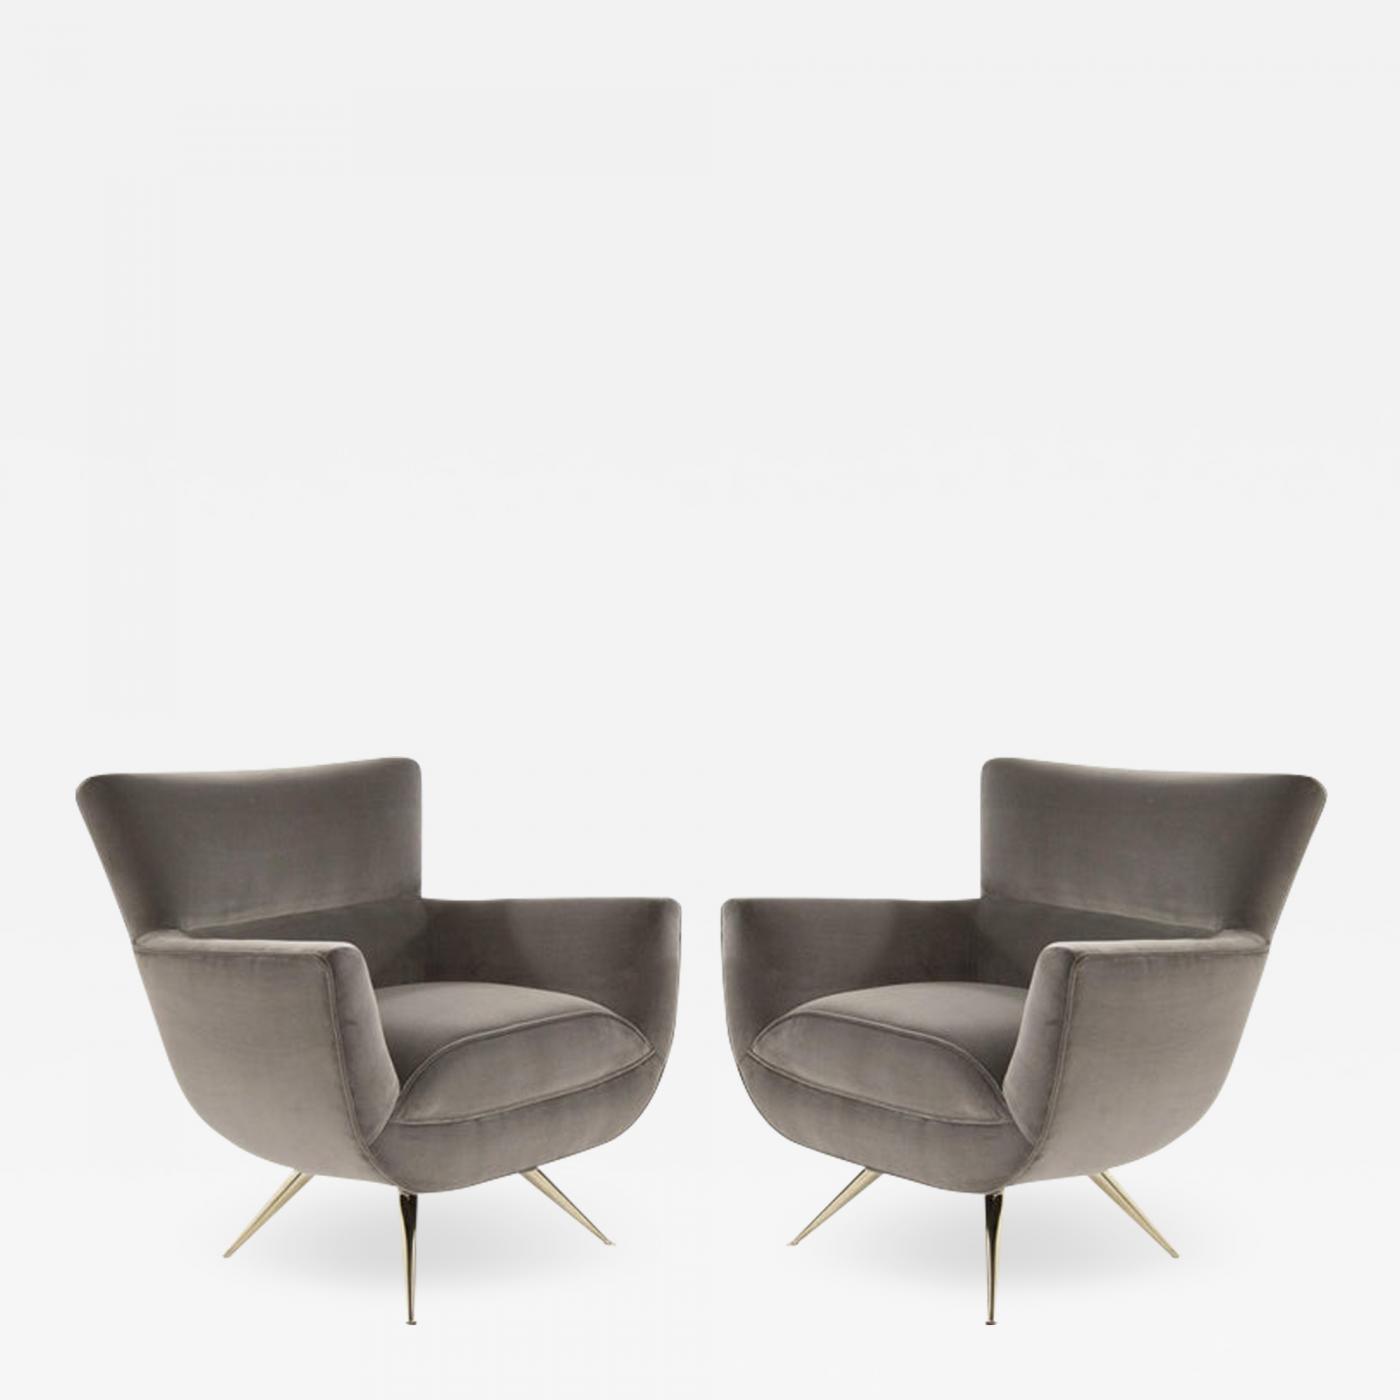 Henry P Glass Mid Century Modern Swivel Chairs By Henry Glass In Grey Velvet